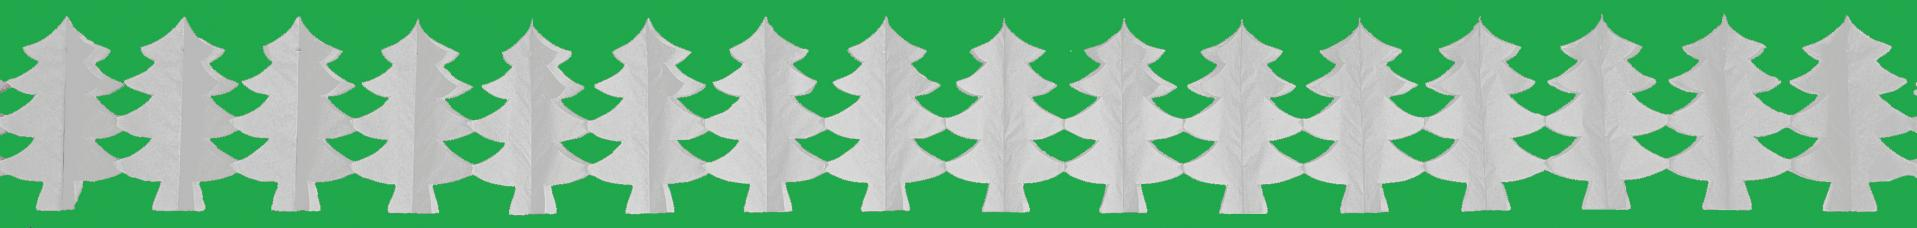 guirlande sapin blanc en papier ignifuge